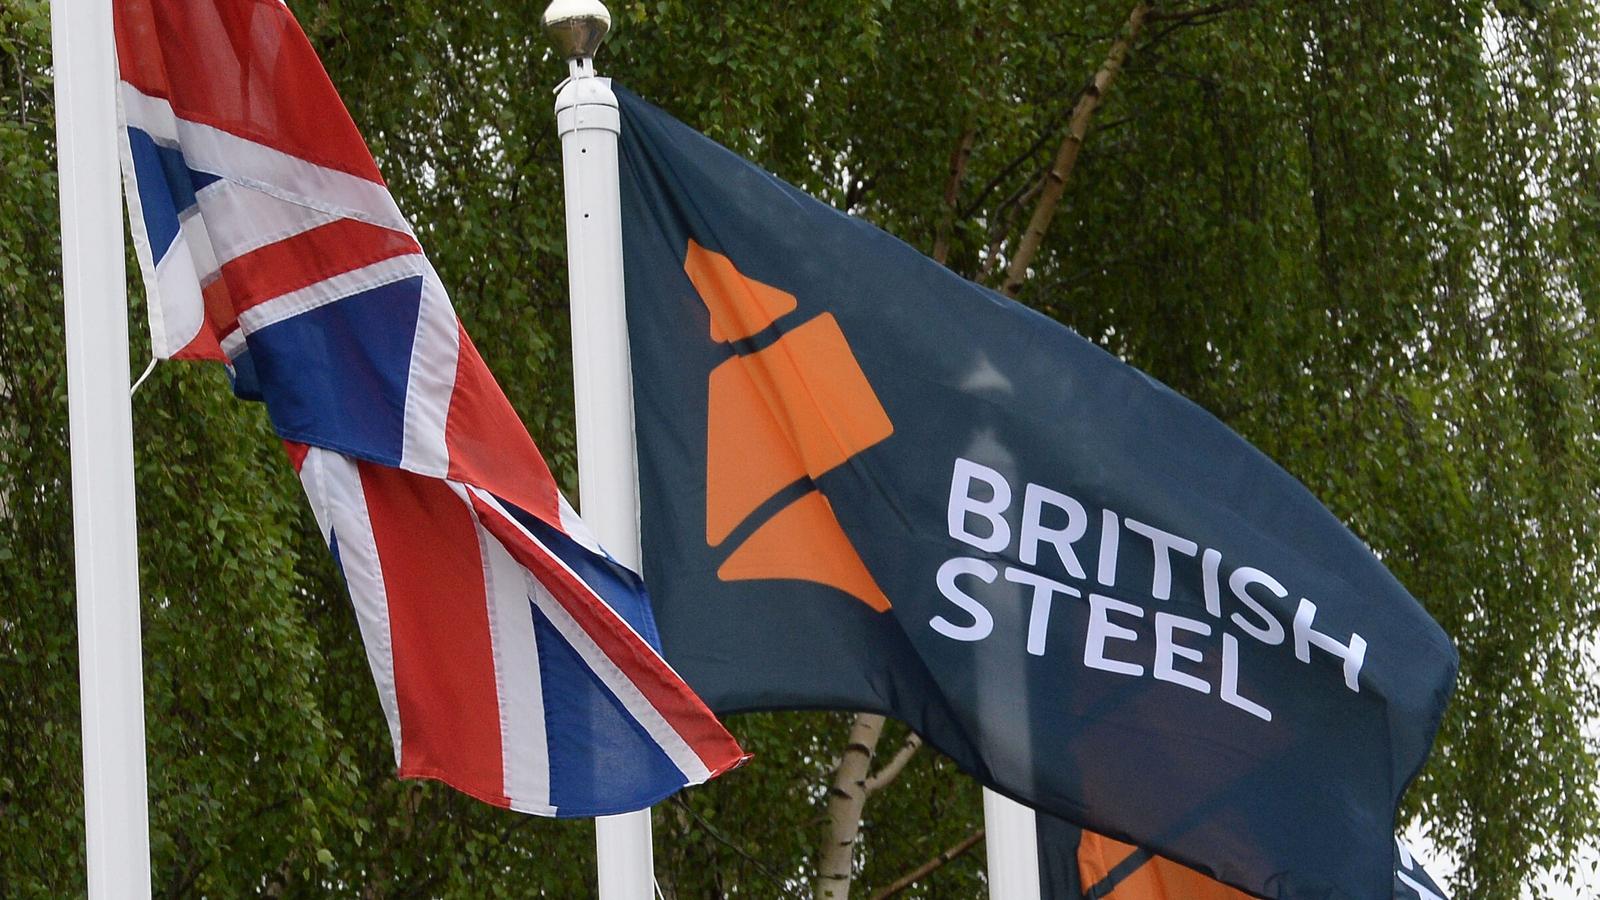 Uk High Court Orders British Steel Into Liquidation